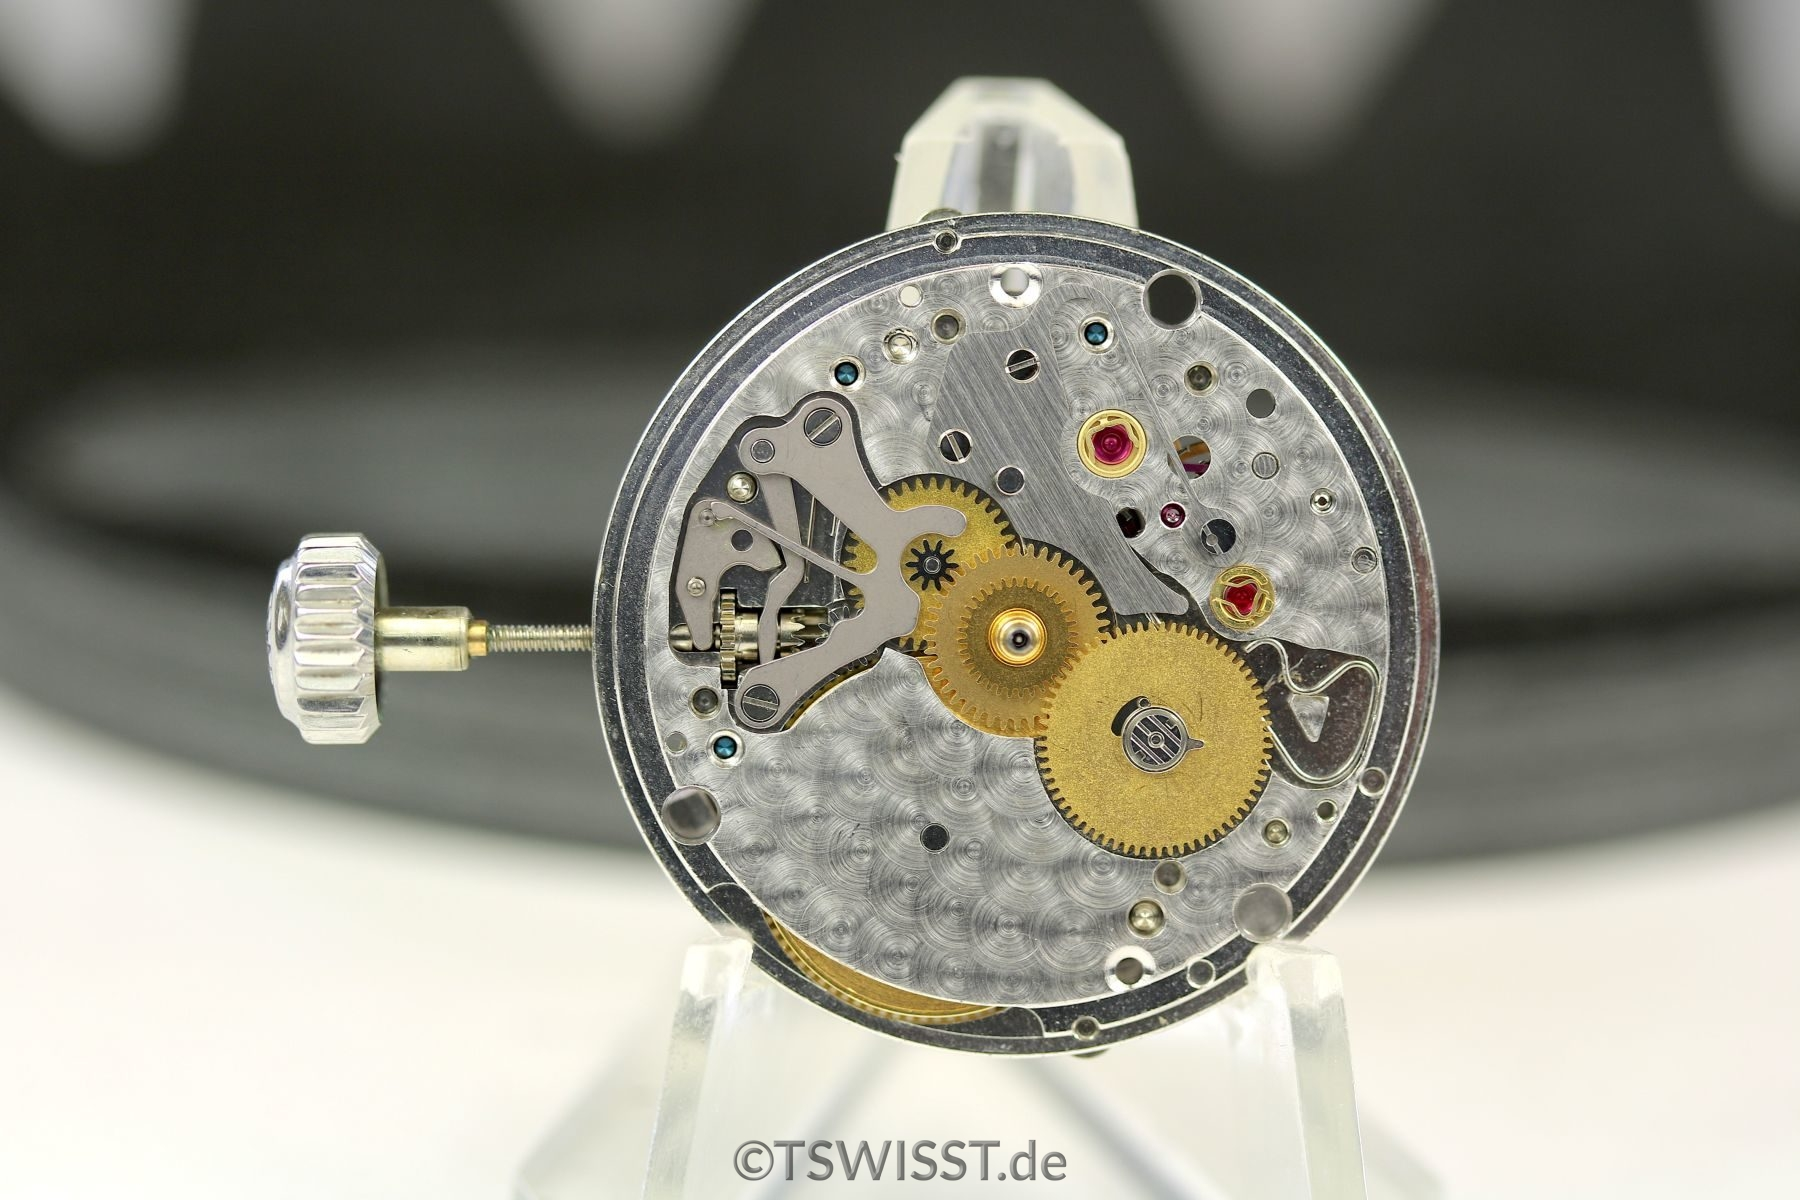 Rolex caliber 1570